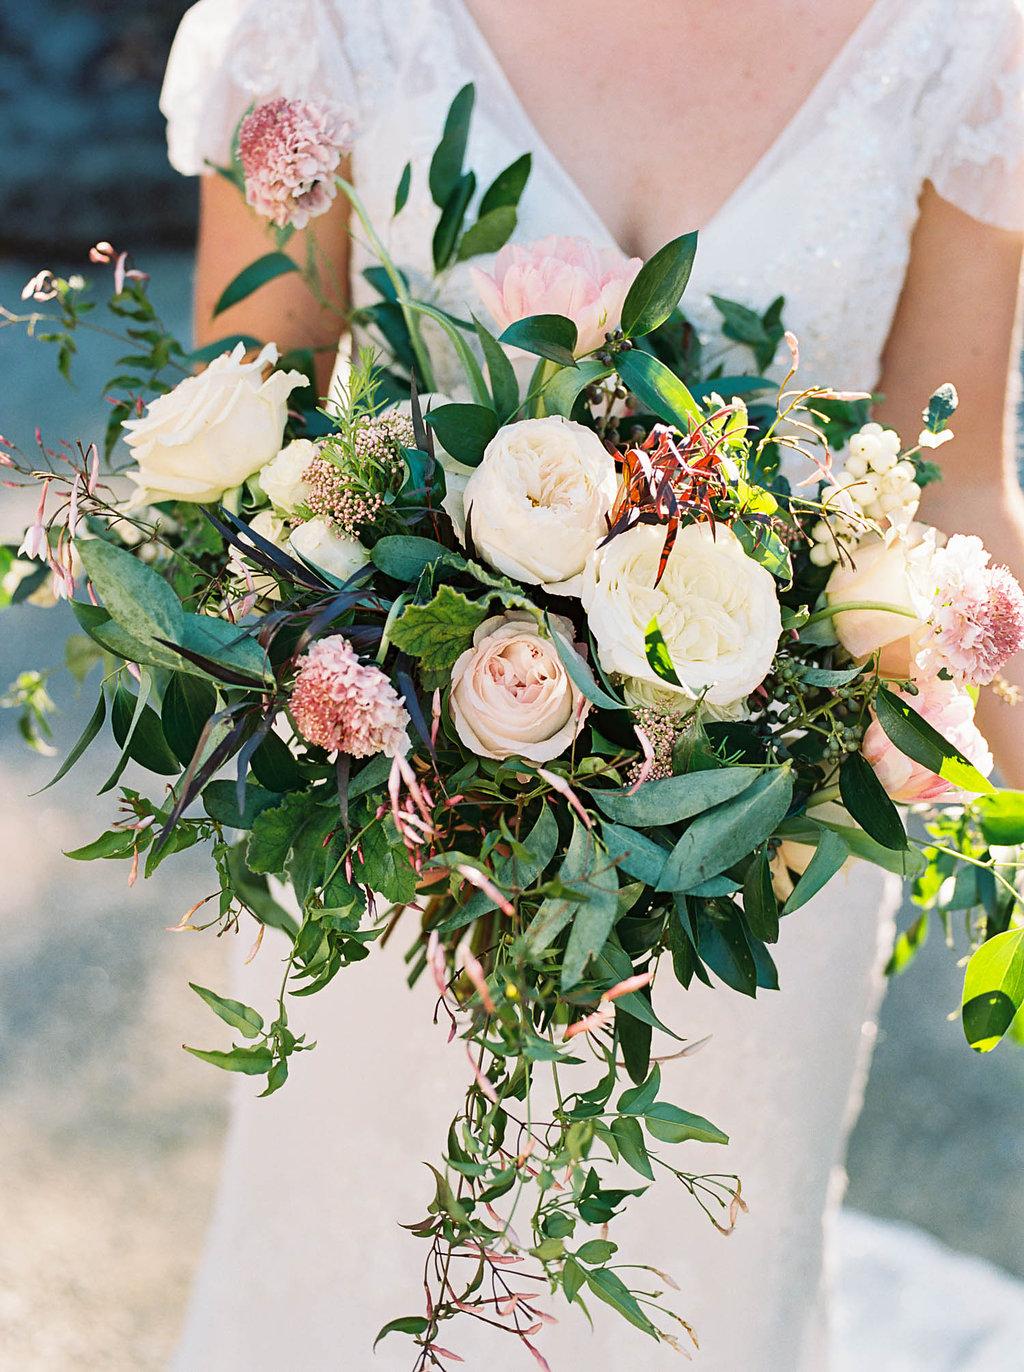 Lush, natural bridal bouquet with blush garden roses, tulips, ranunculus, and greenery // Nashville Wedding Florist